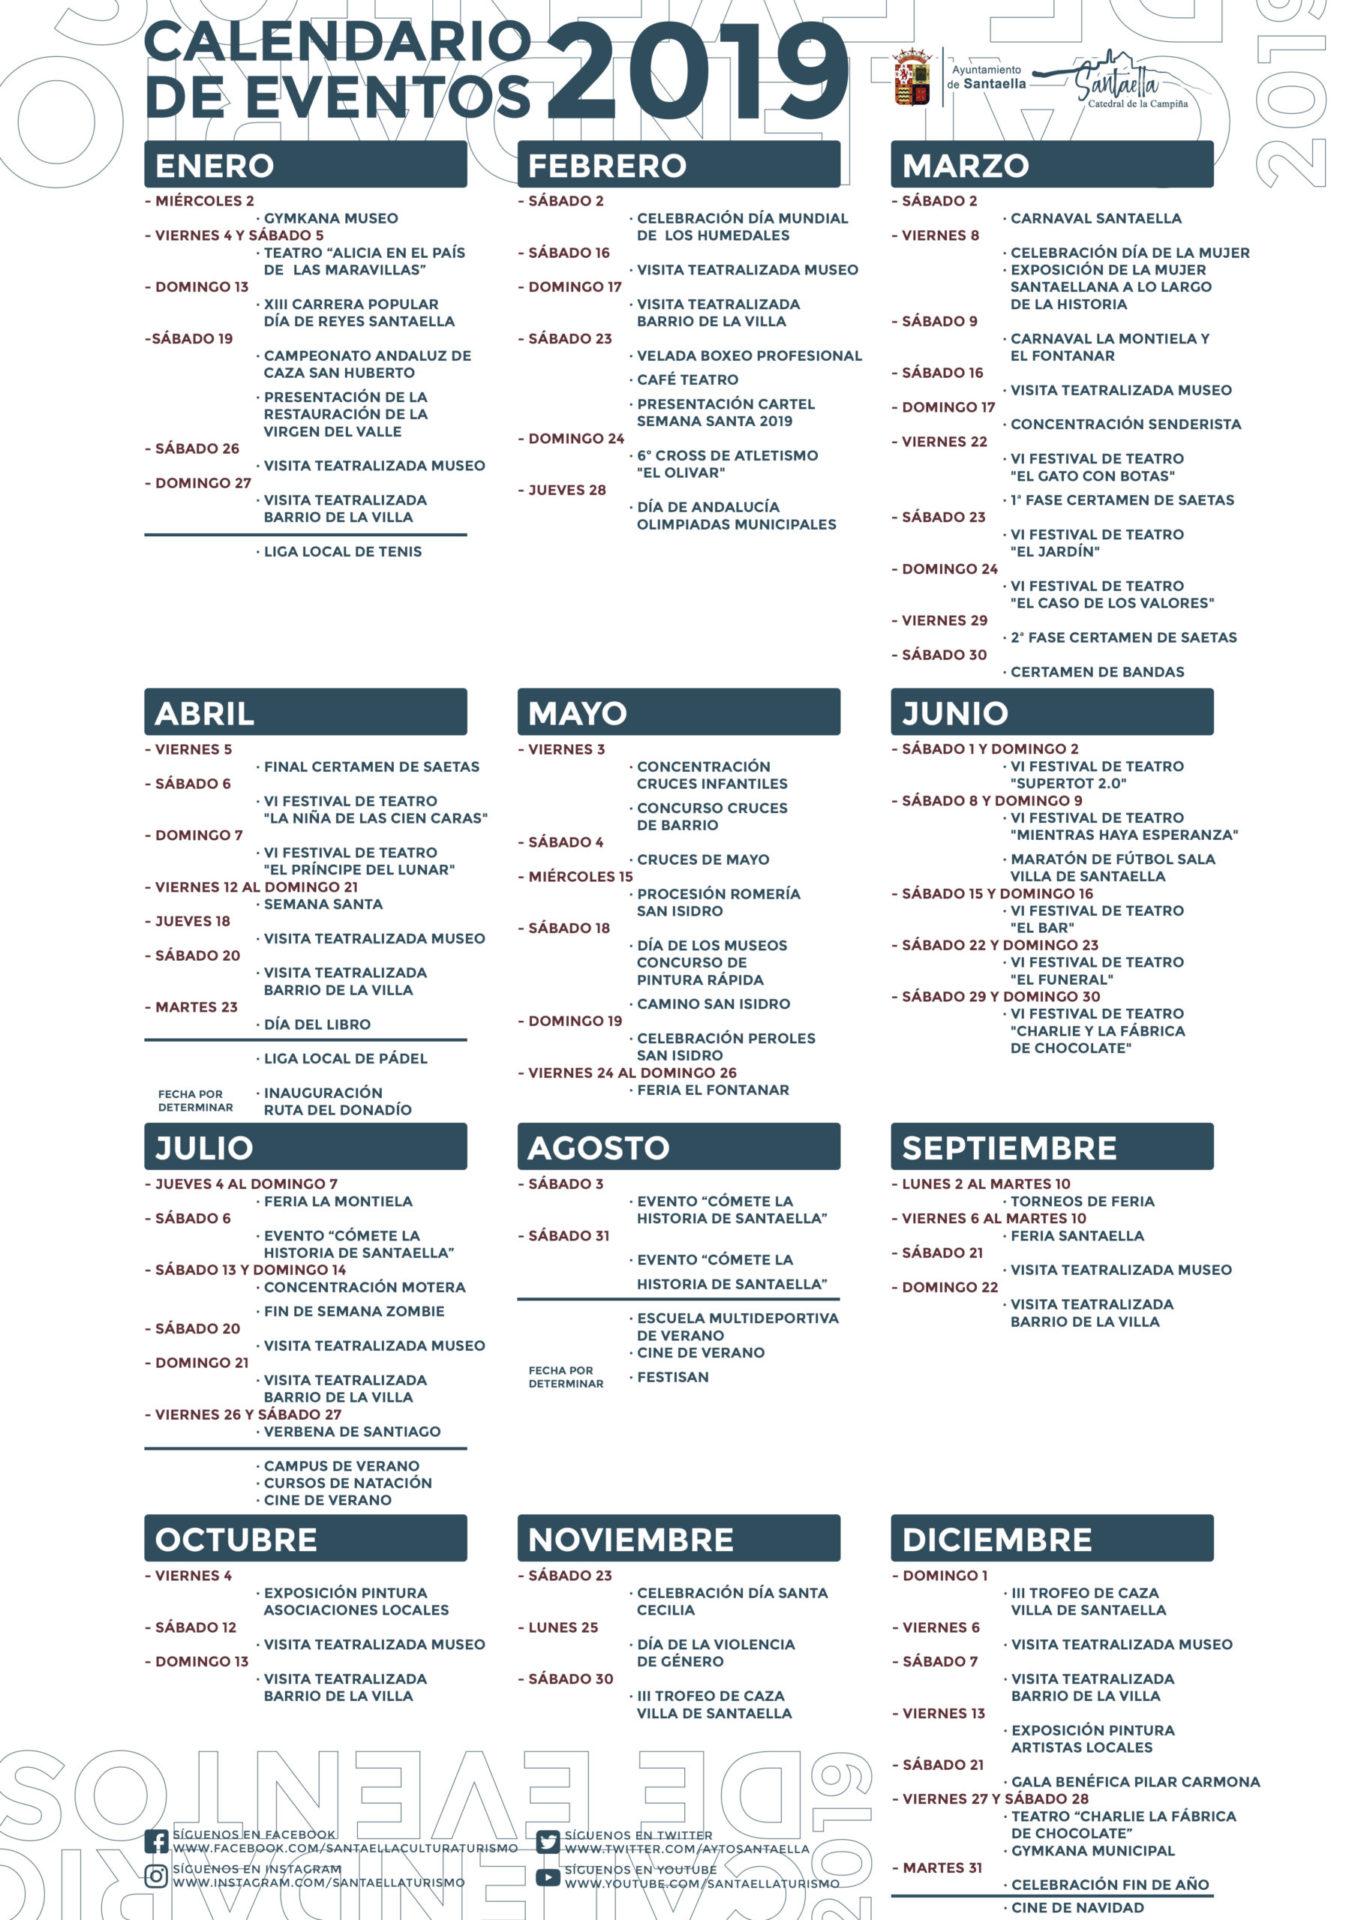 Calendario de eventos de 2019